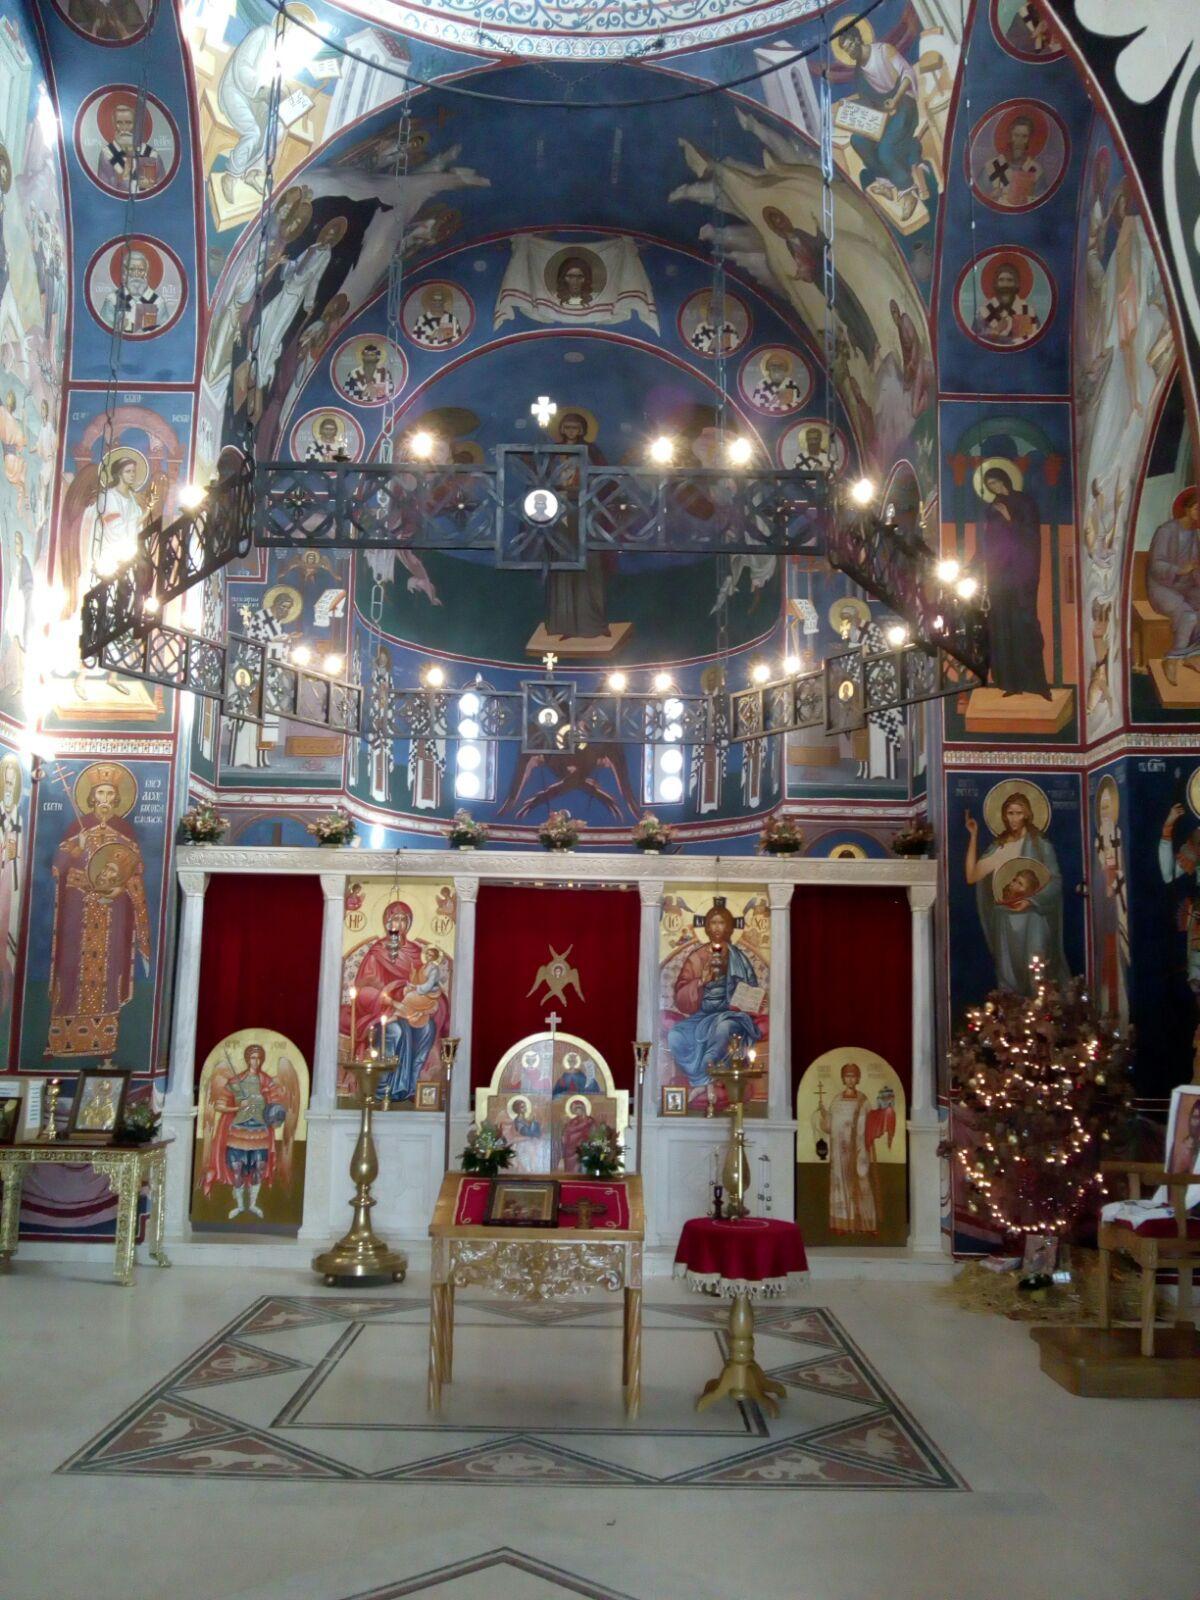 Crkva Svetog Kneza Lazara Ljubic Cacak Cacak Ortodoxy Church Church Cak Fair Grounds